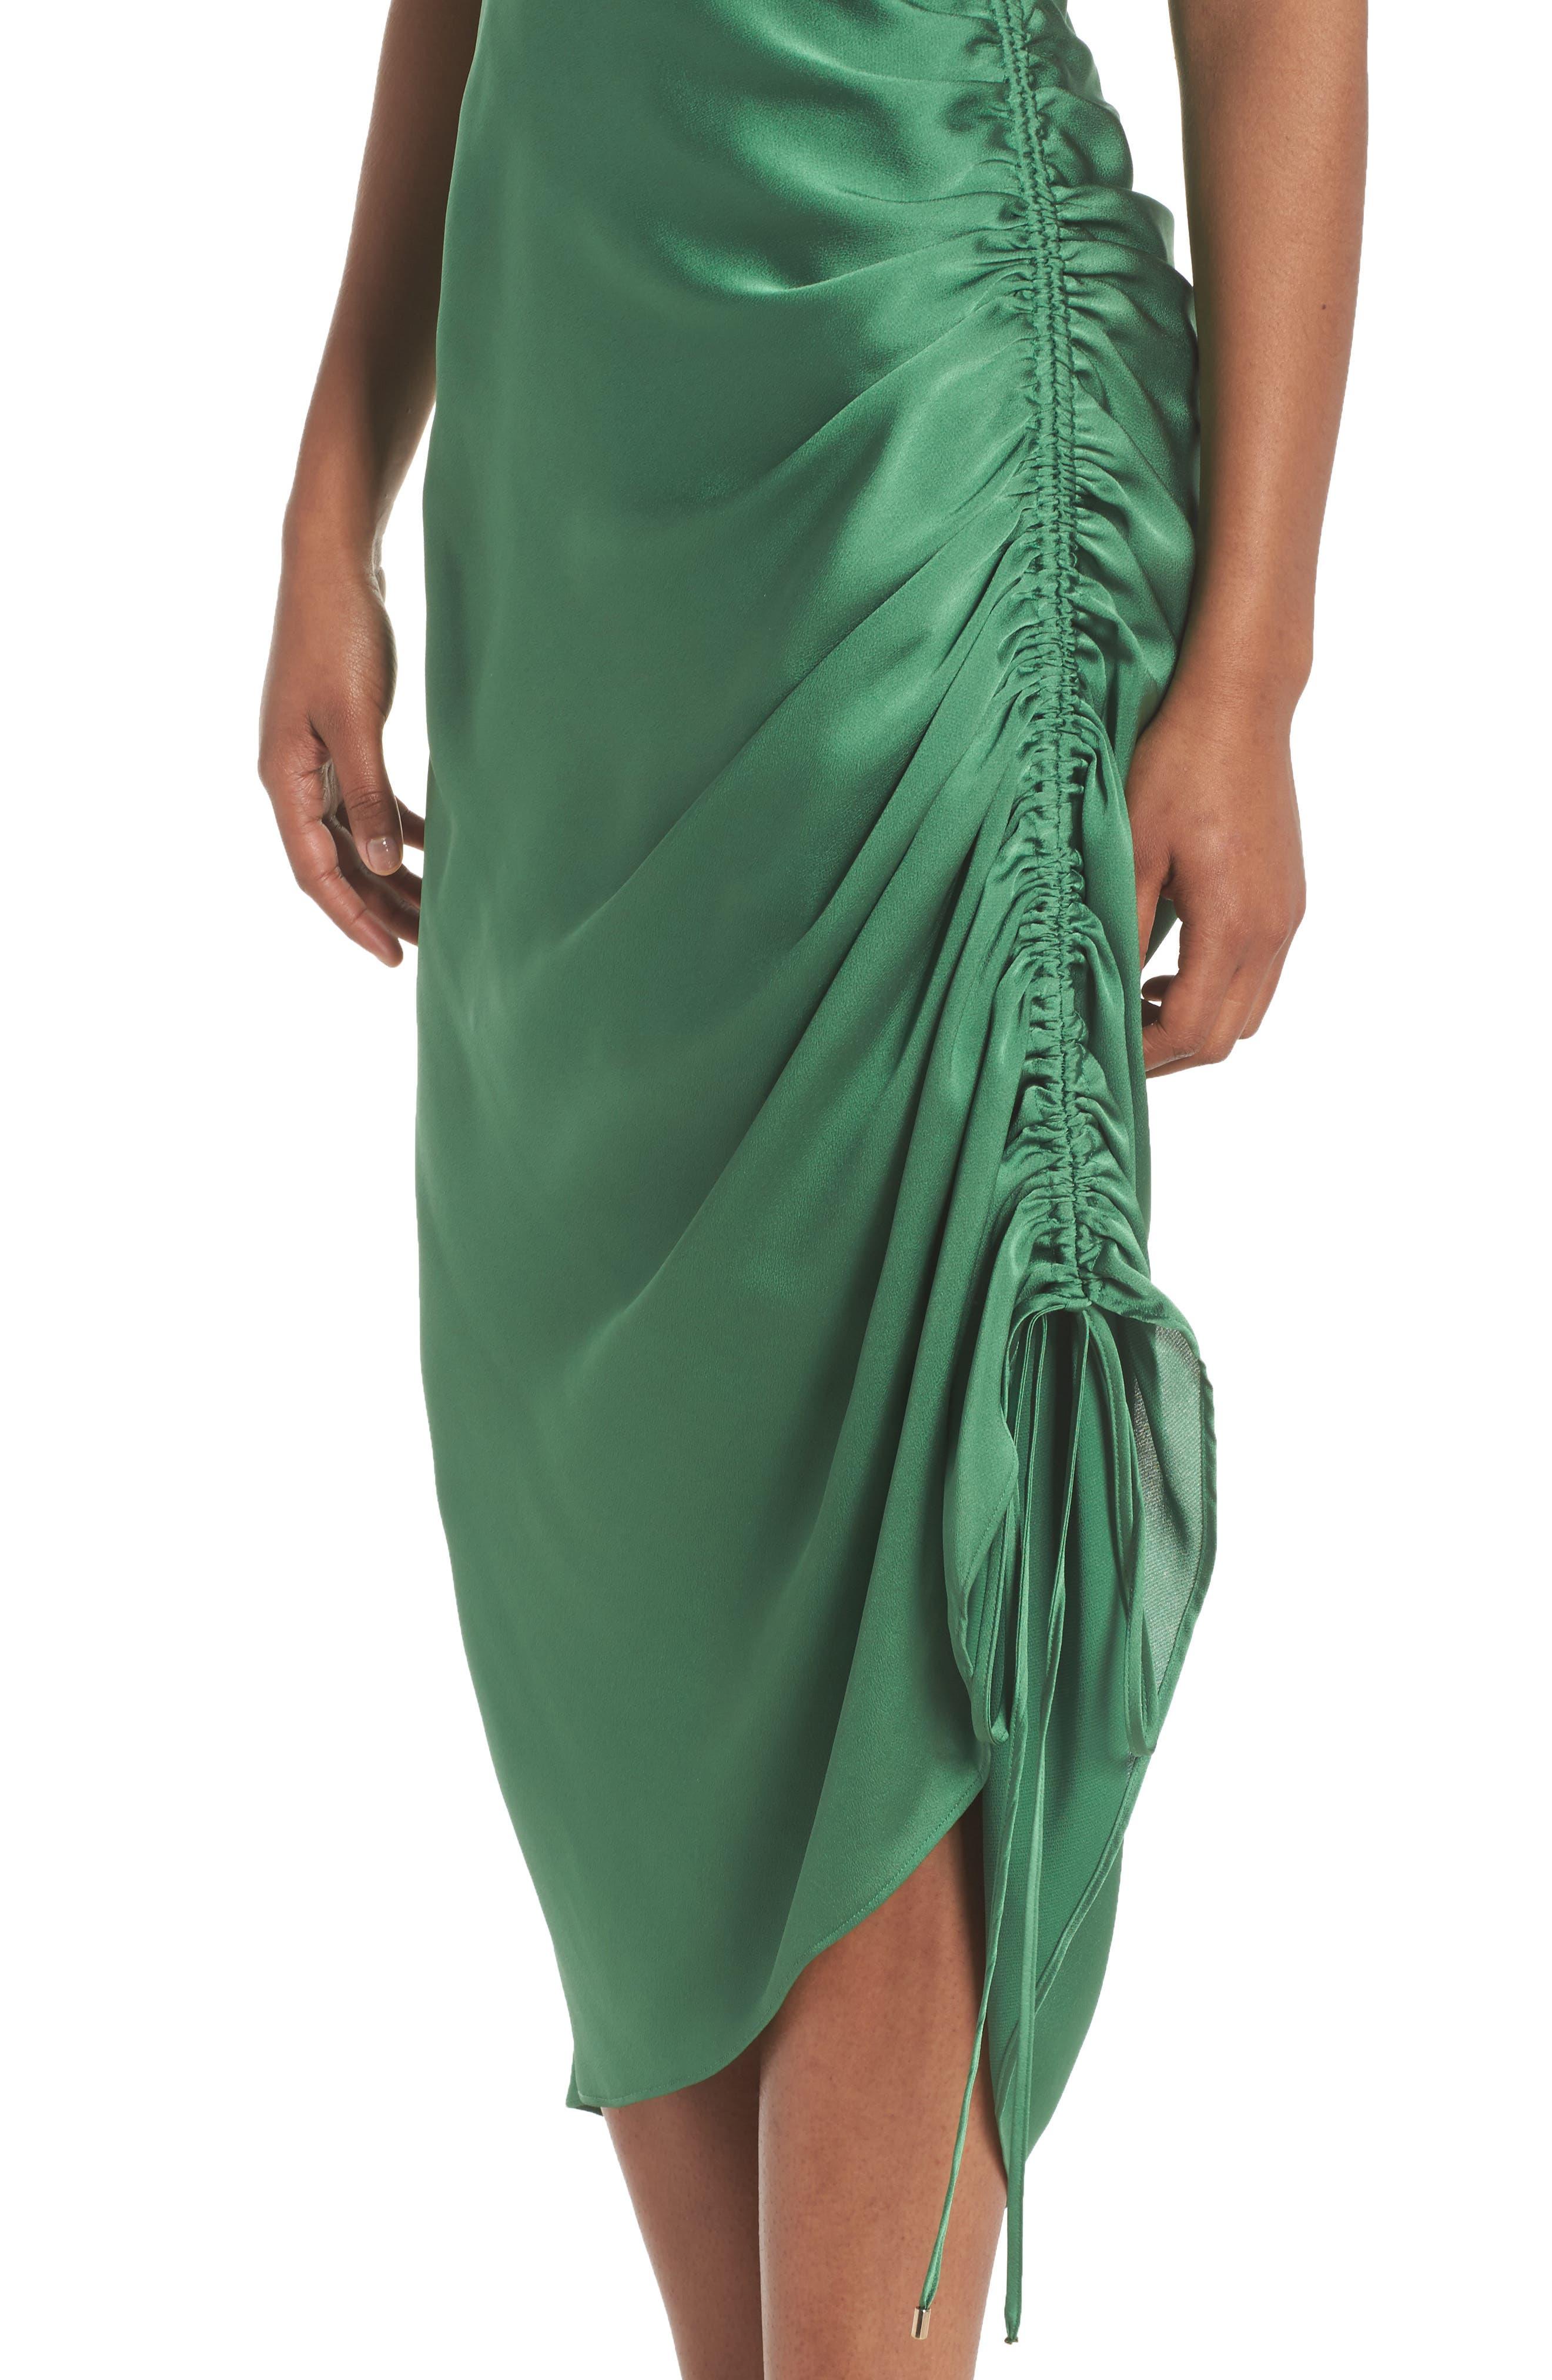 I've Got You Asymmetrical Satin Dress,                             Alternate thumbnail 4, color,                             Emerald Green